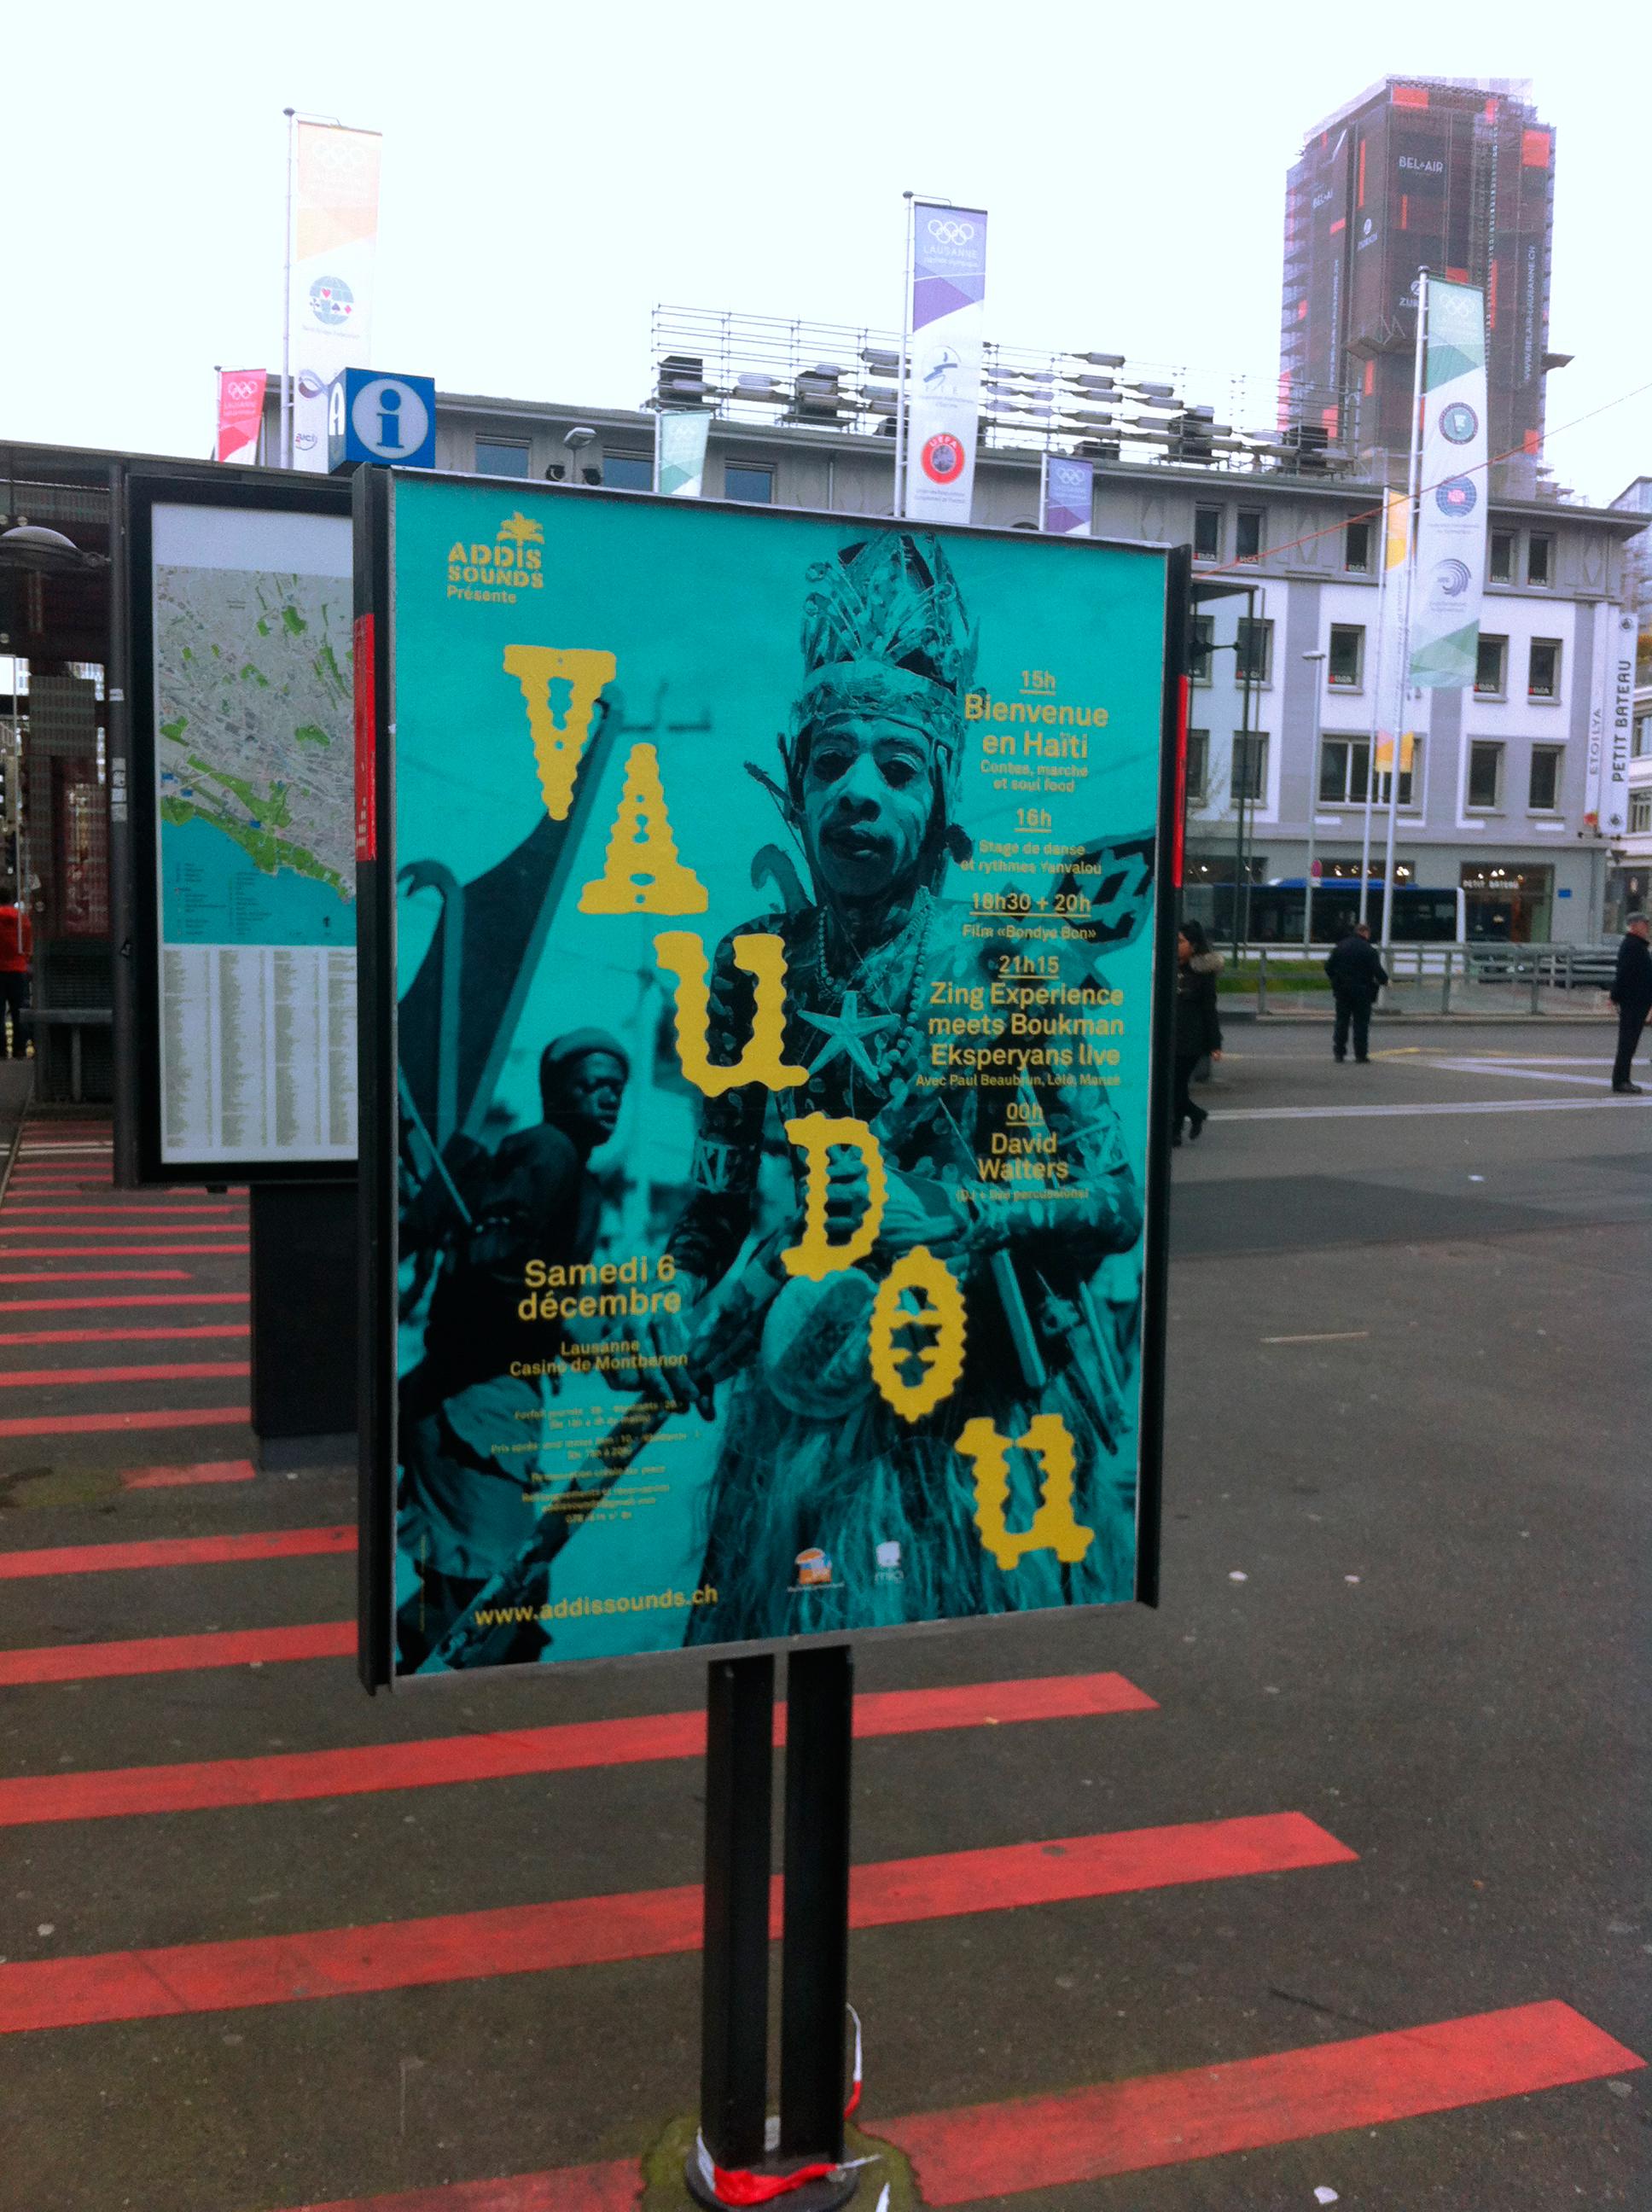 Addissound_Vaudou